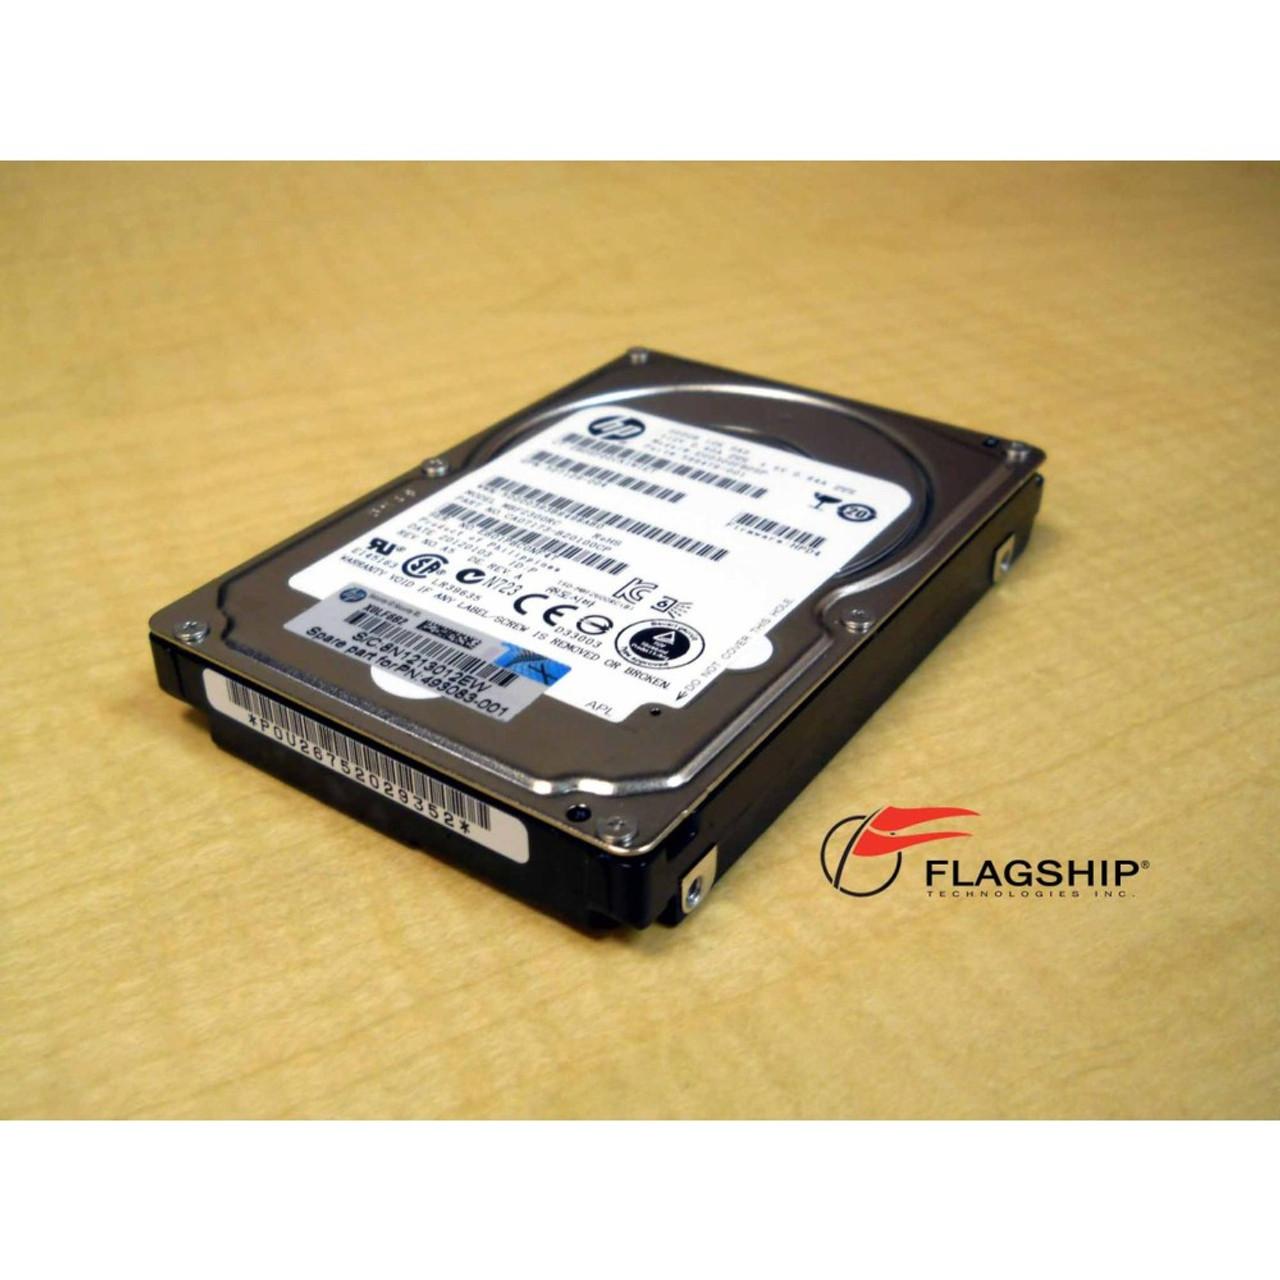 HP 300GB 10K 6G 2.5 SAS DUAL PORT HARD DRIVE 507127-B21 507129-004